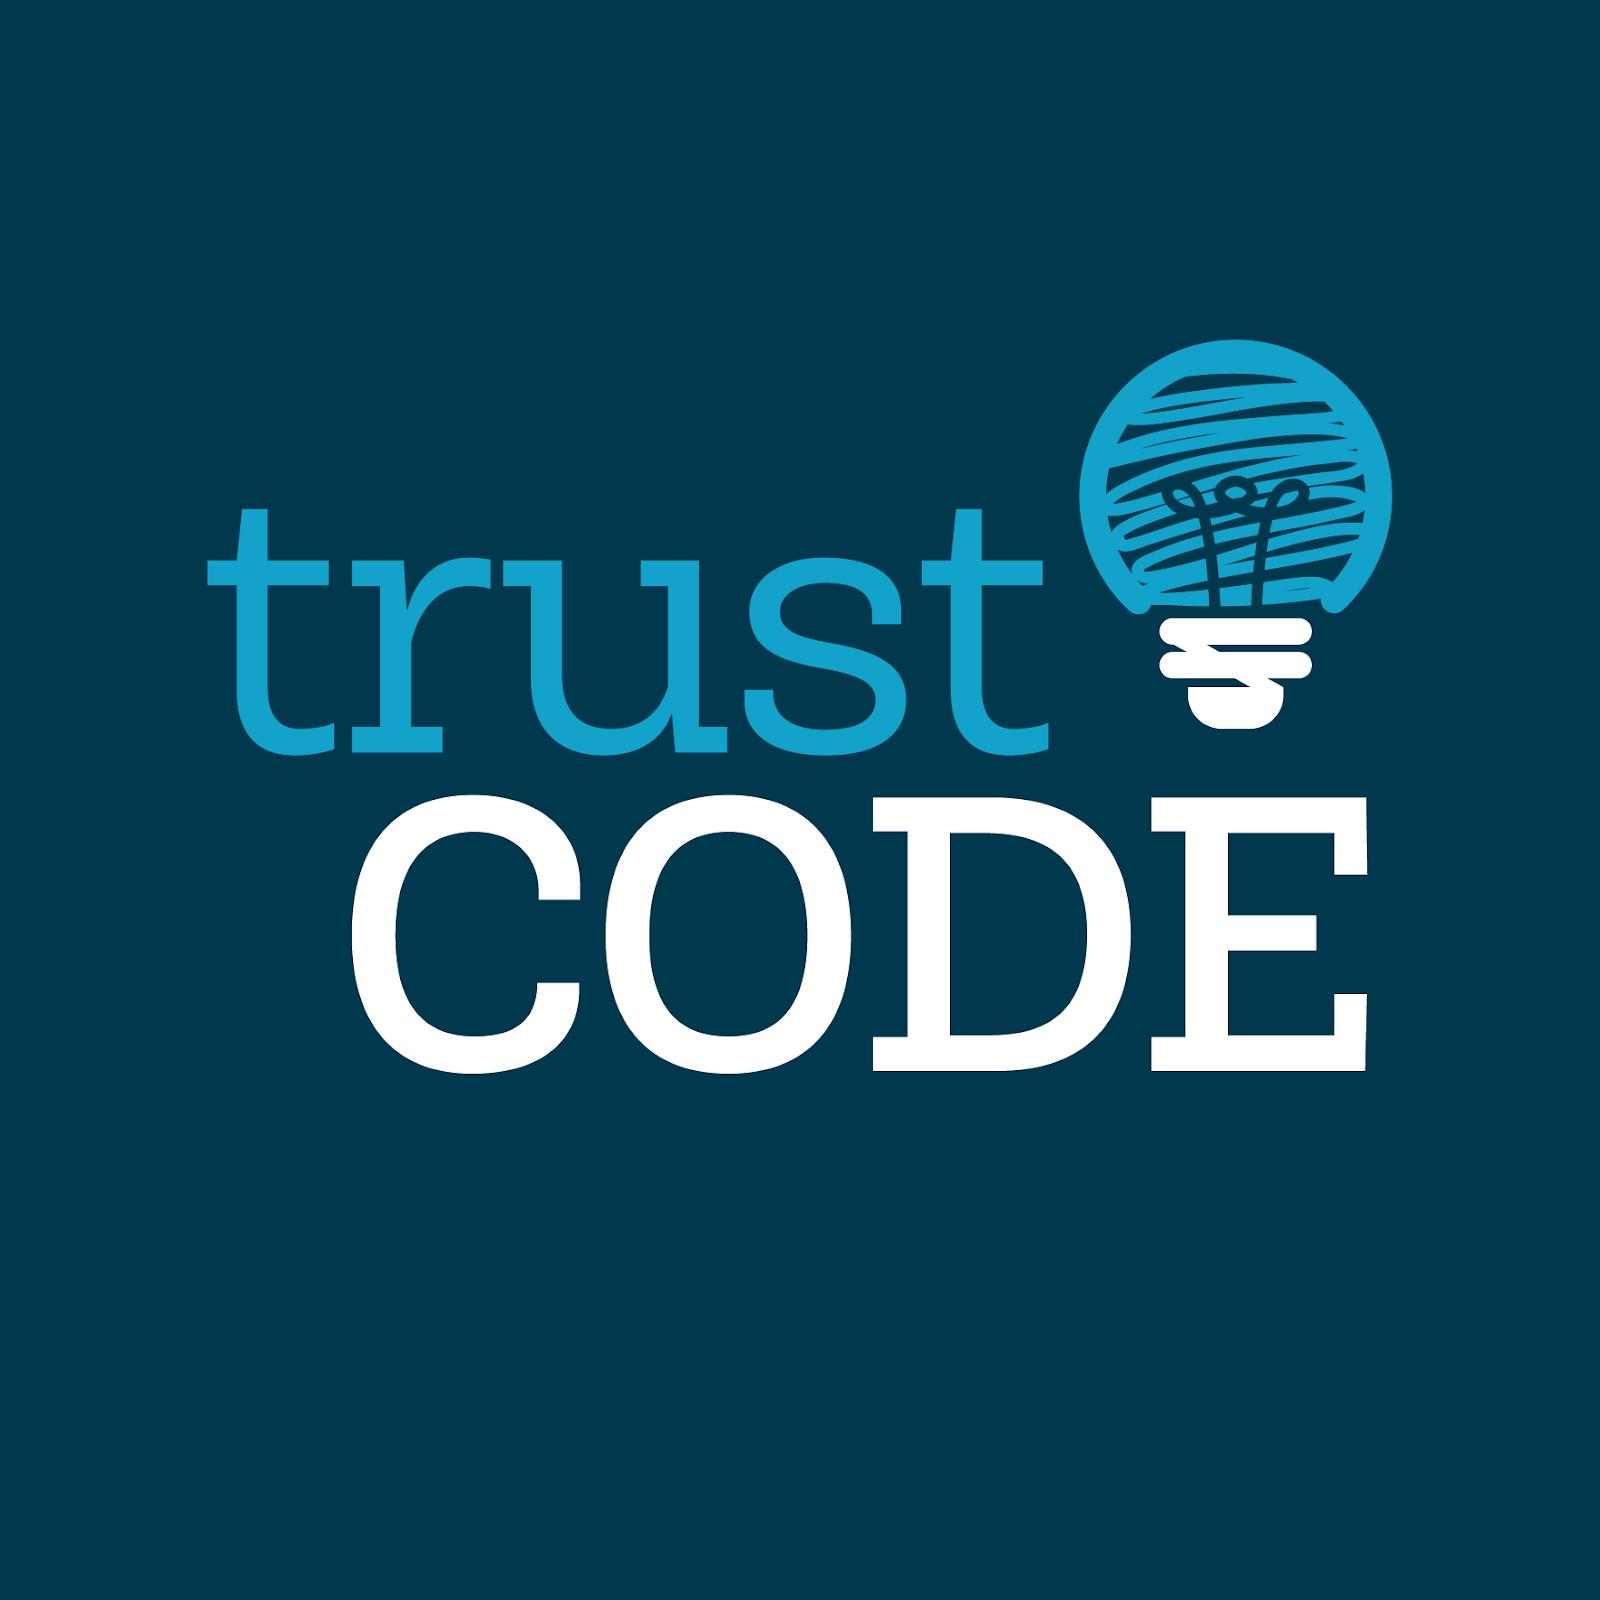 trustcode_facebook-01.png